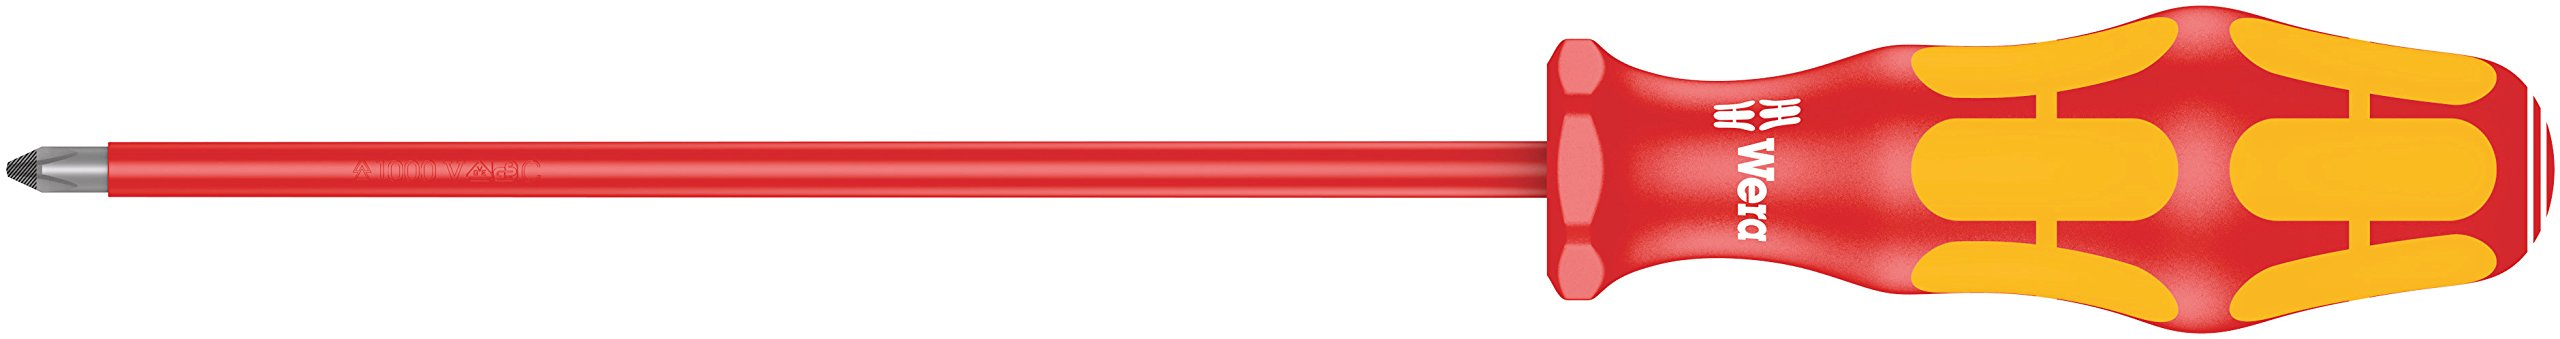 Wera 05006153001 Kraftform Plus VDE 162i PH Phillips Insulated Screwdriver, PH 1 Head, 6'' Blade Length by Wera